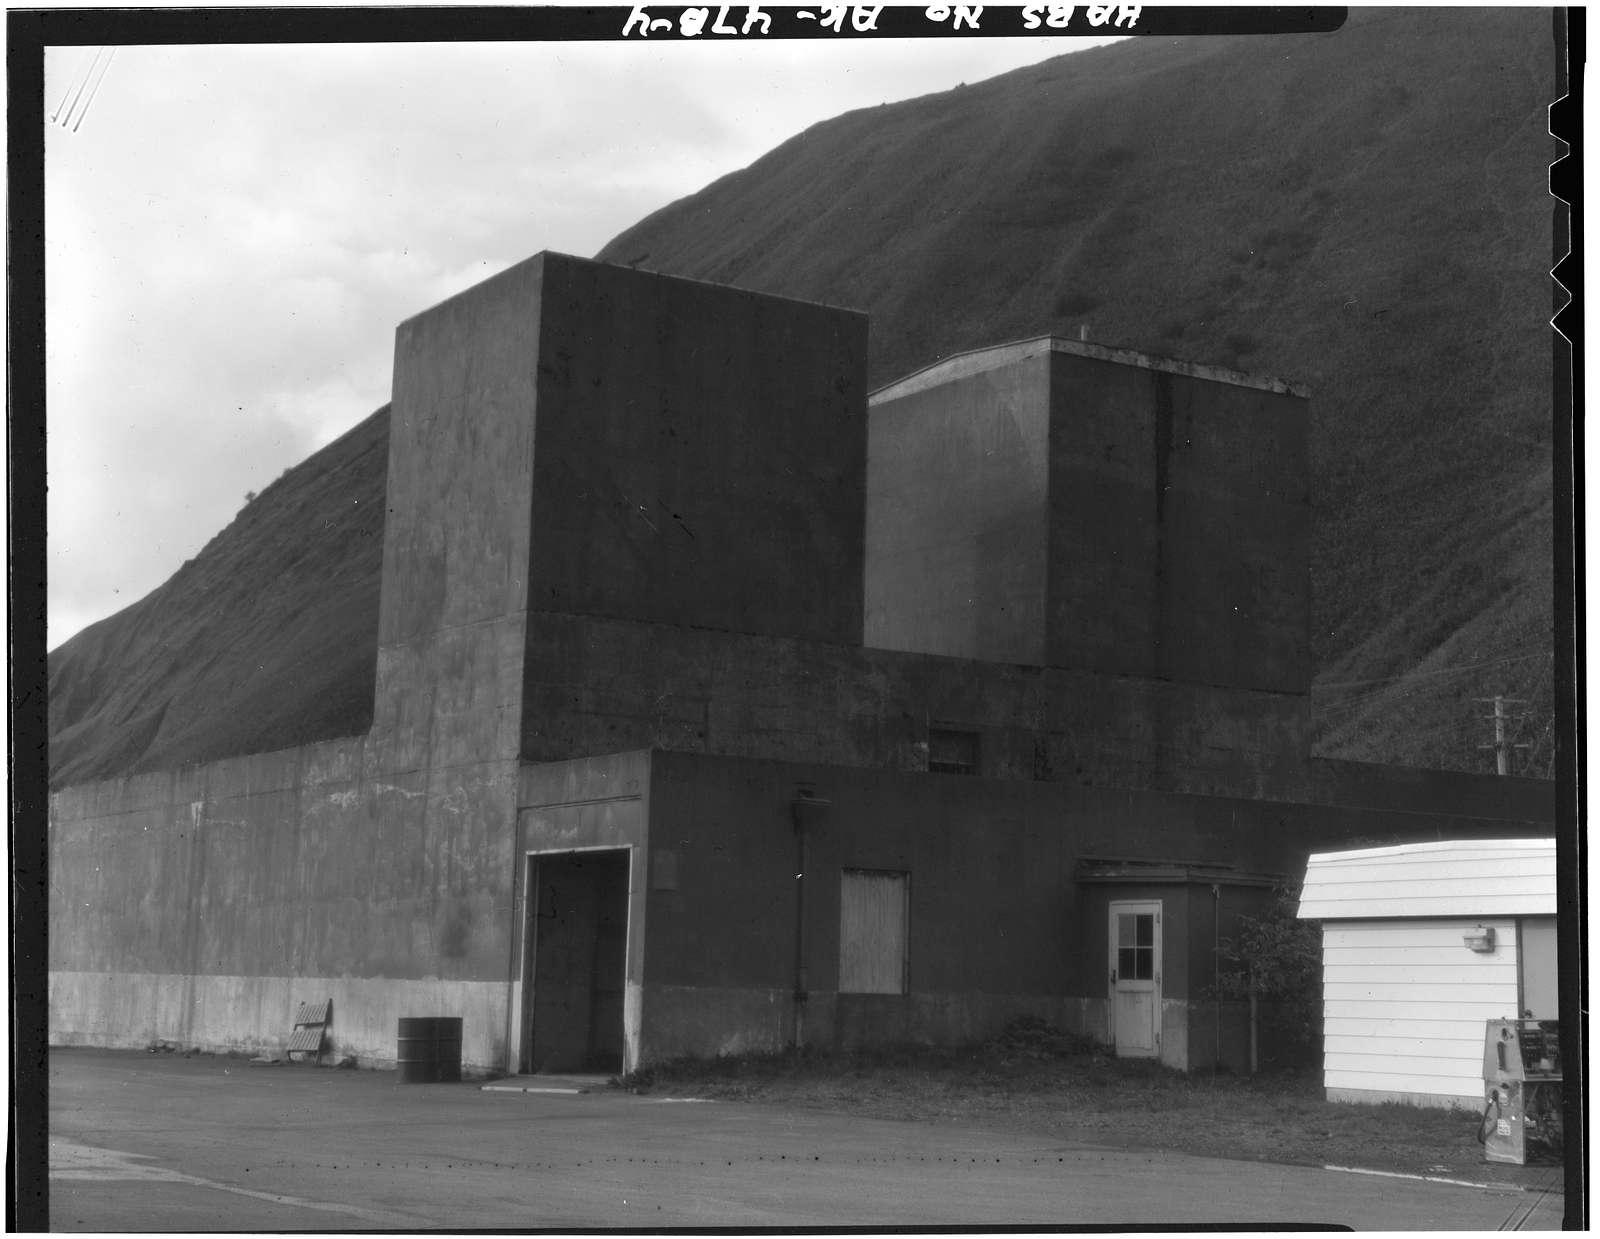 Kodiak Naval Operating Base, Aircraft Engine Test Building, Fifth Street & Tom Styles Road, U.S. Coast Guard Station, Kodiak, Kodiak Island Borough, AK